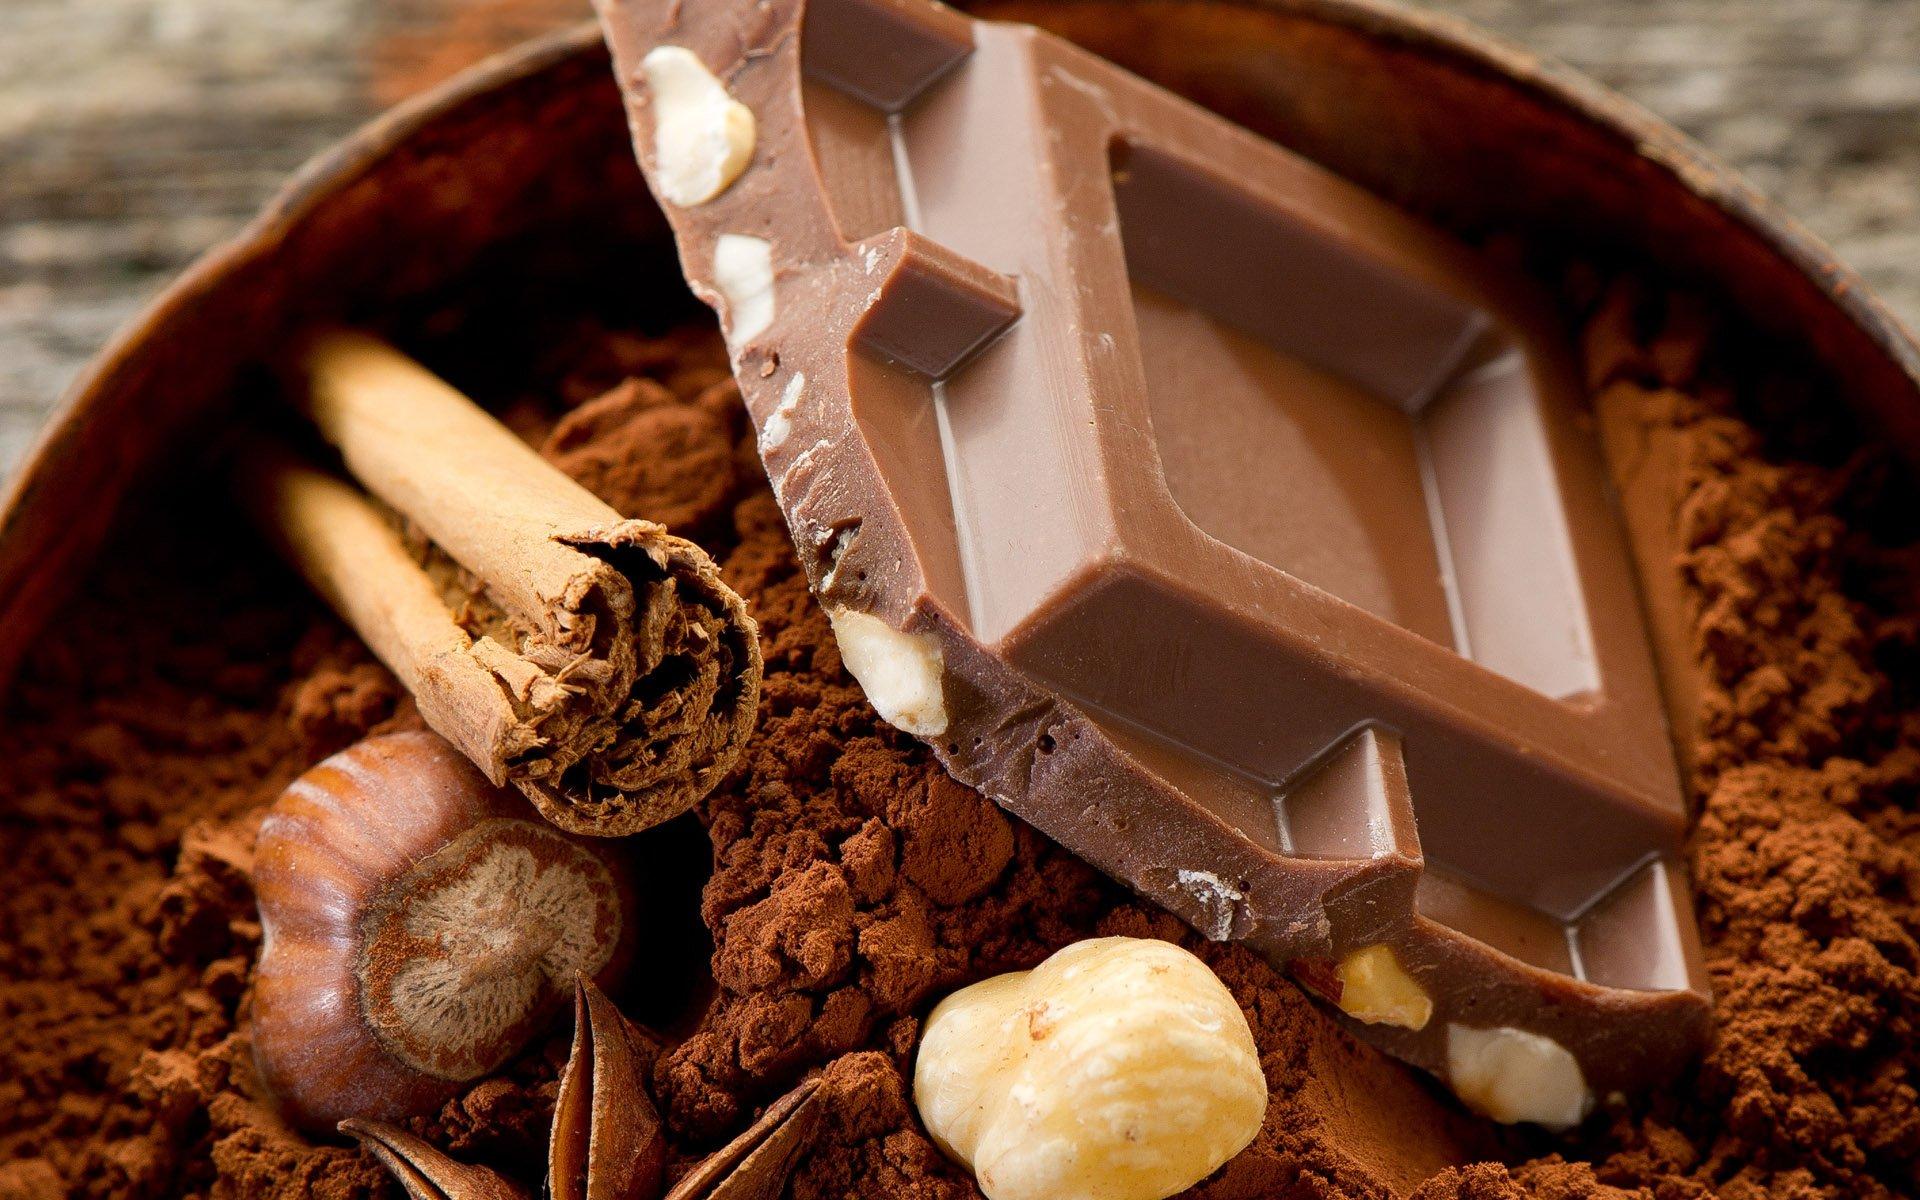 Fondos De Pantalla De Chocolates: Chocolate Full HD Fondo De Pantalla And Fondo De